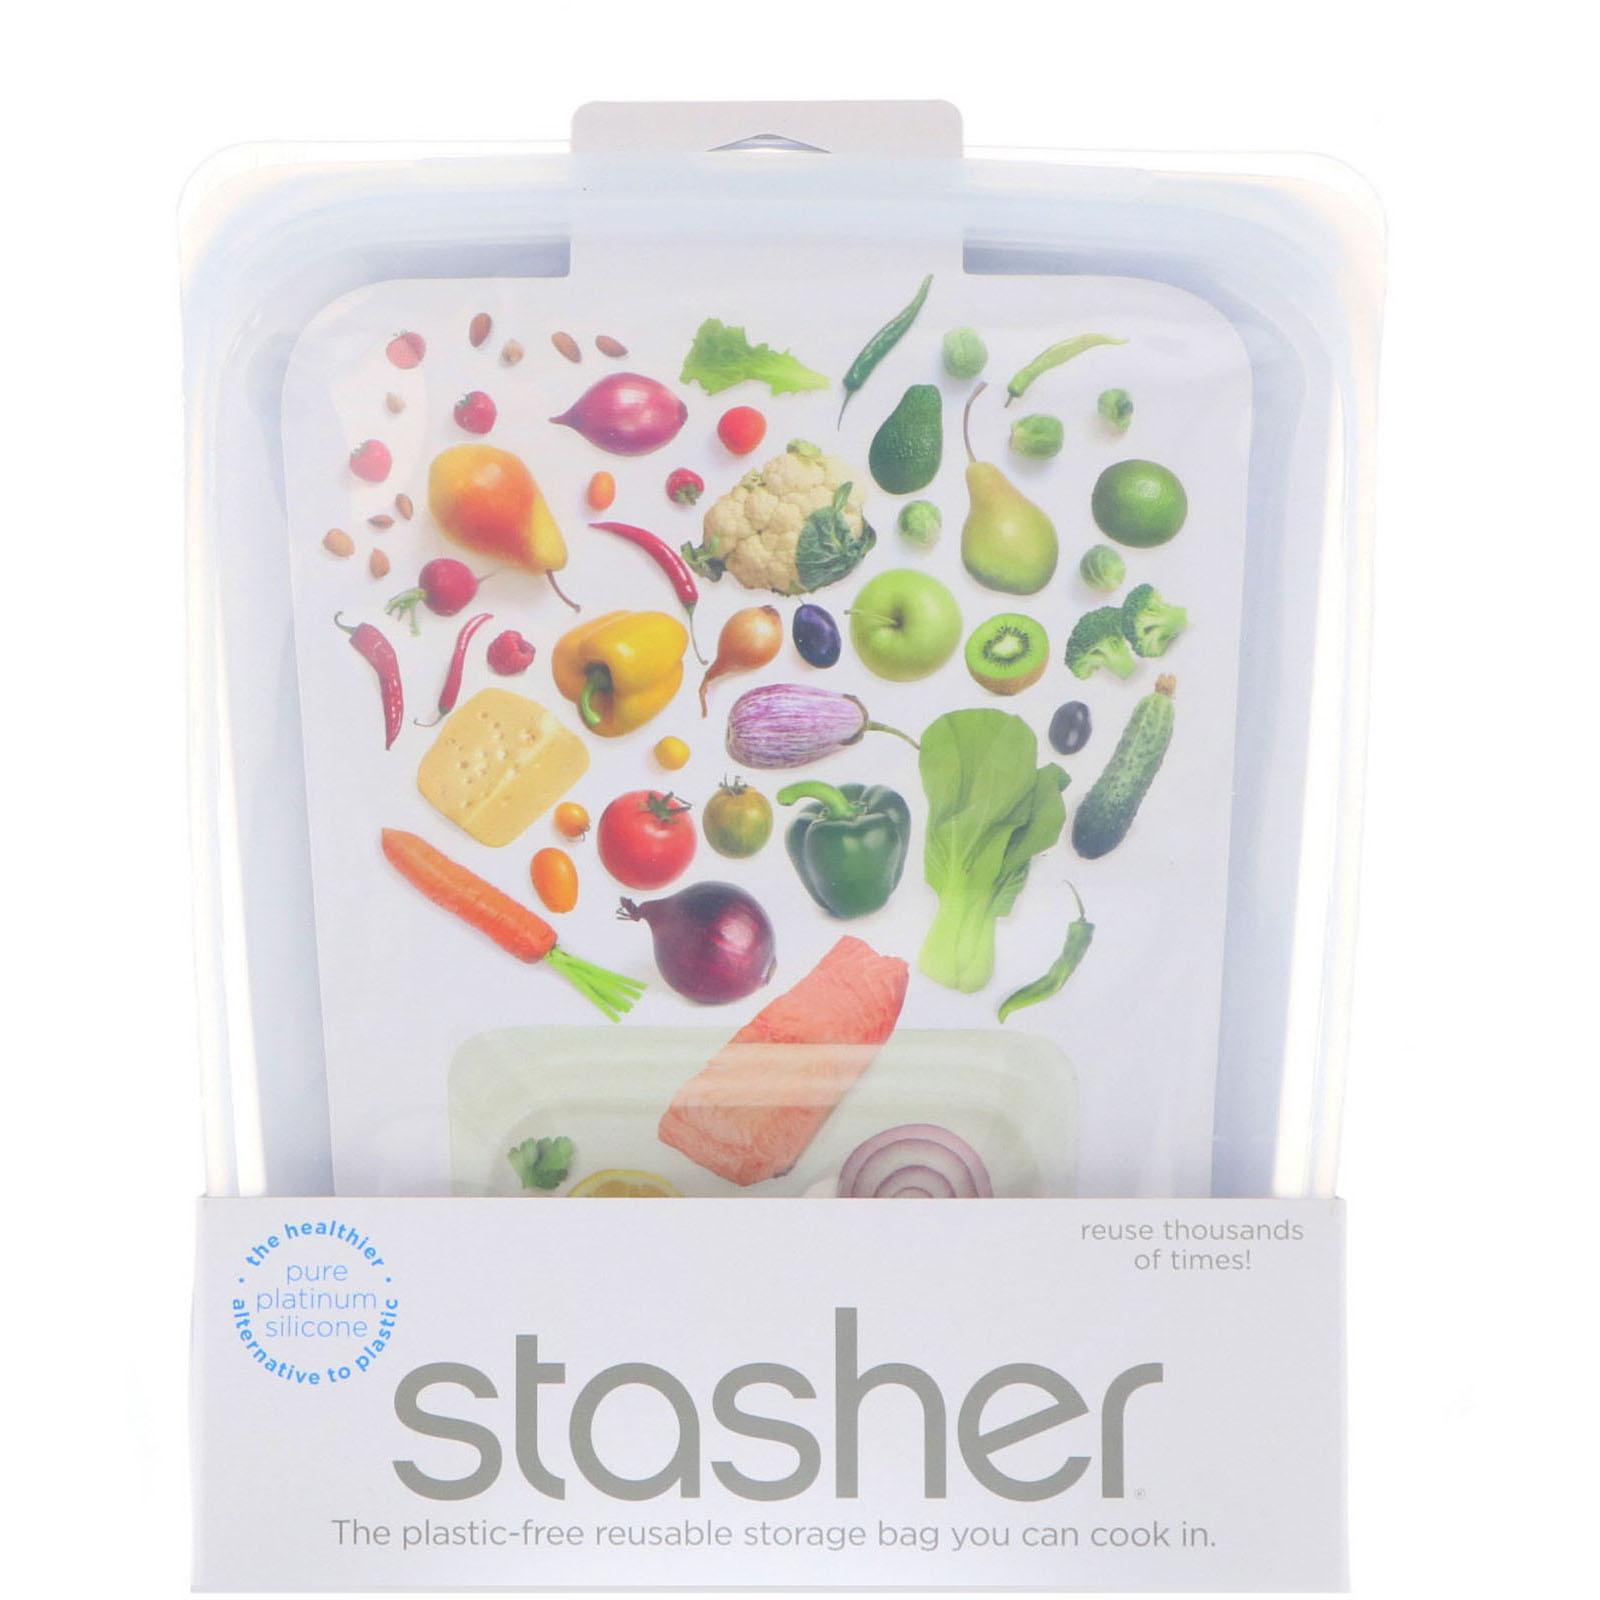 3bf2f96e67fec Stasher, Reusable Silicone Food Bag, Half Gallon Bag, Clear, 64.2 fl ...